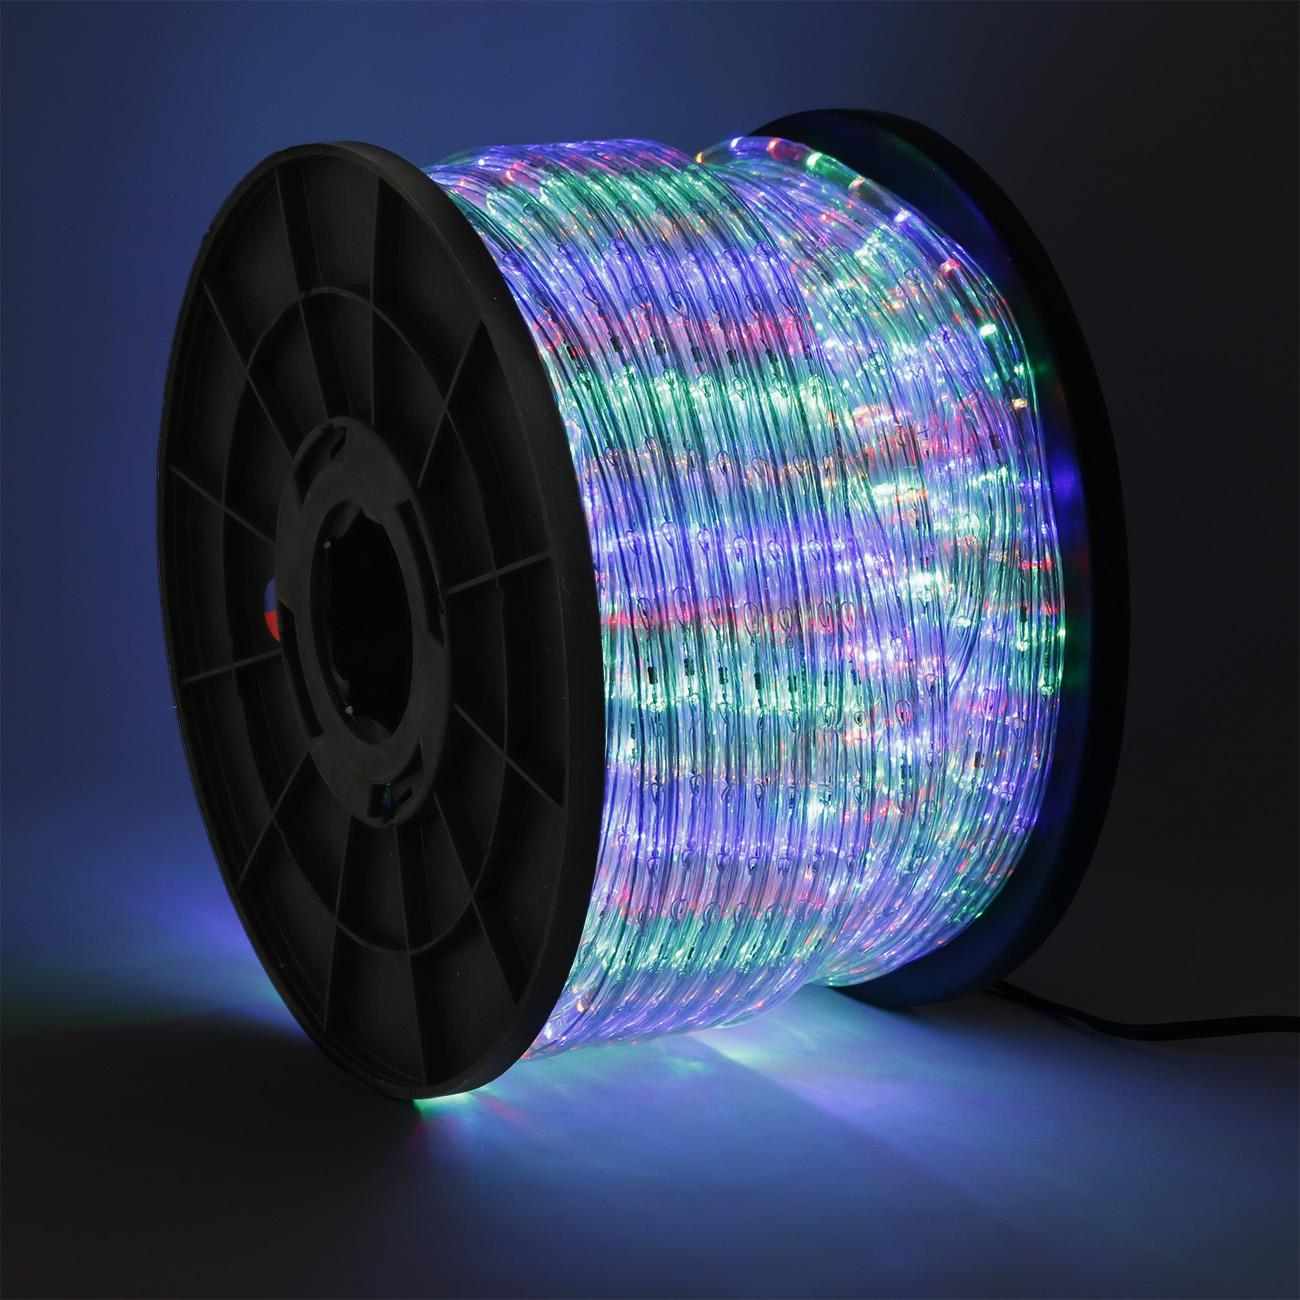 50 100 150 300Ft LED Rope Light 110V Home Party Christmas